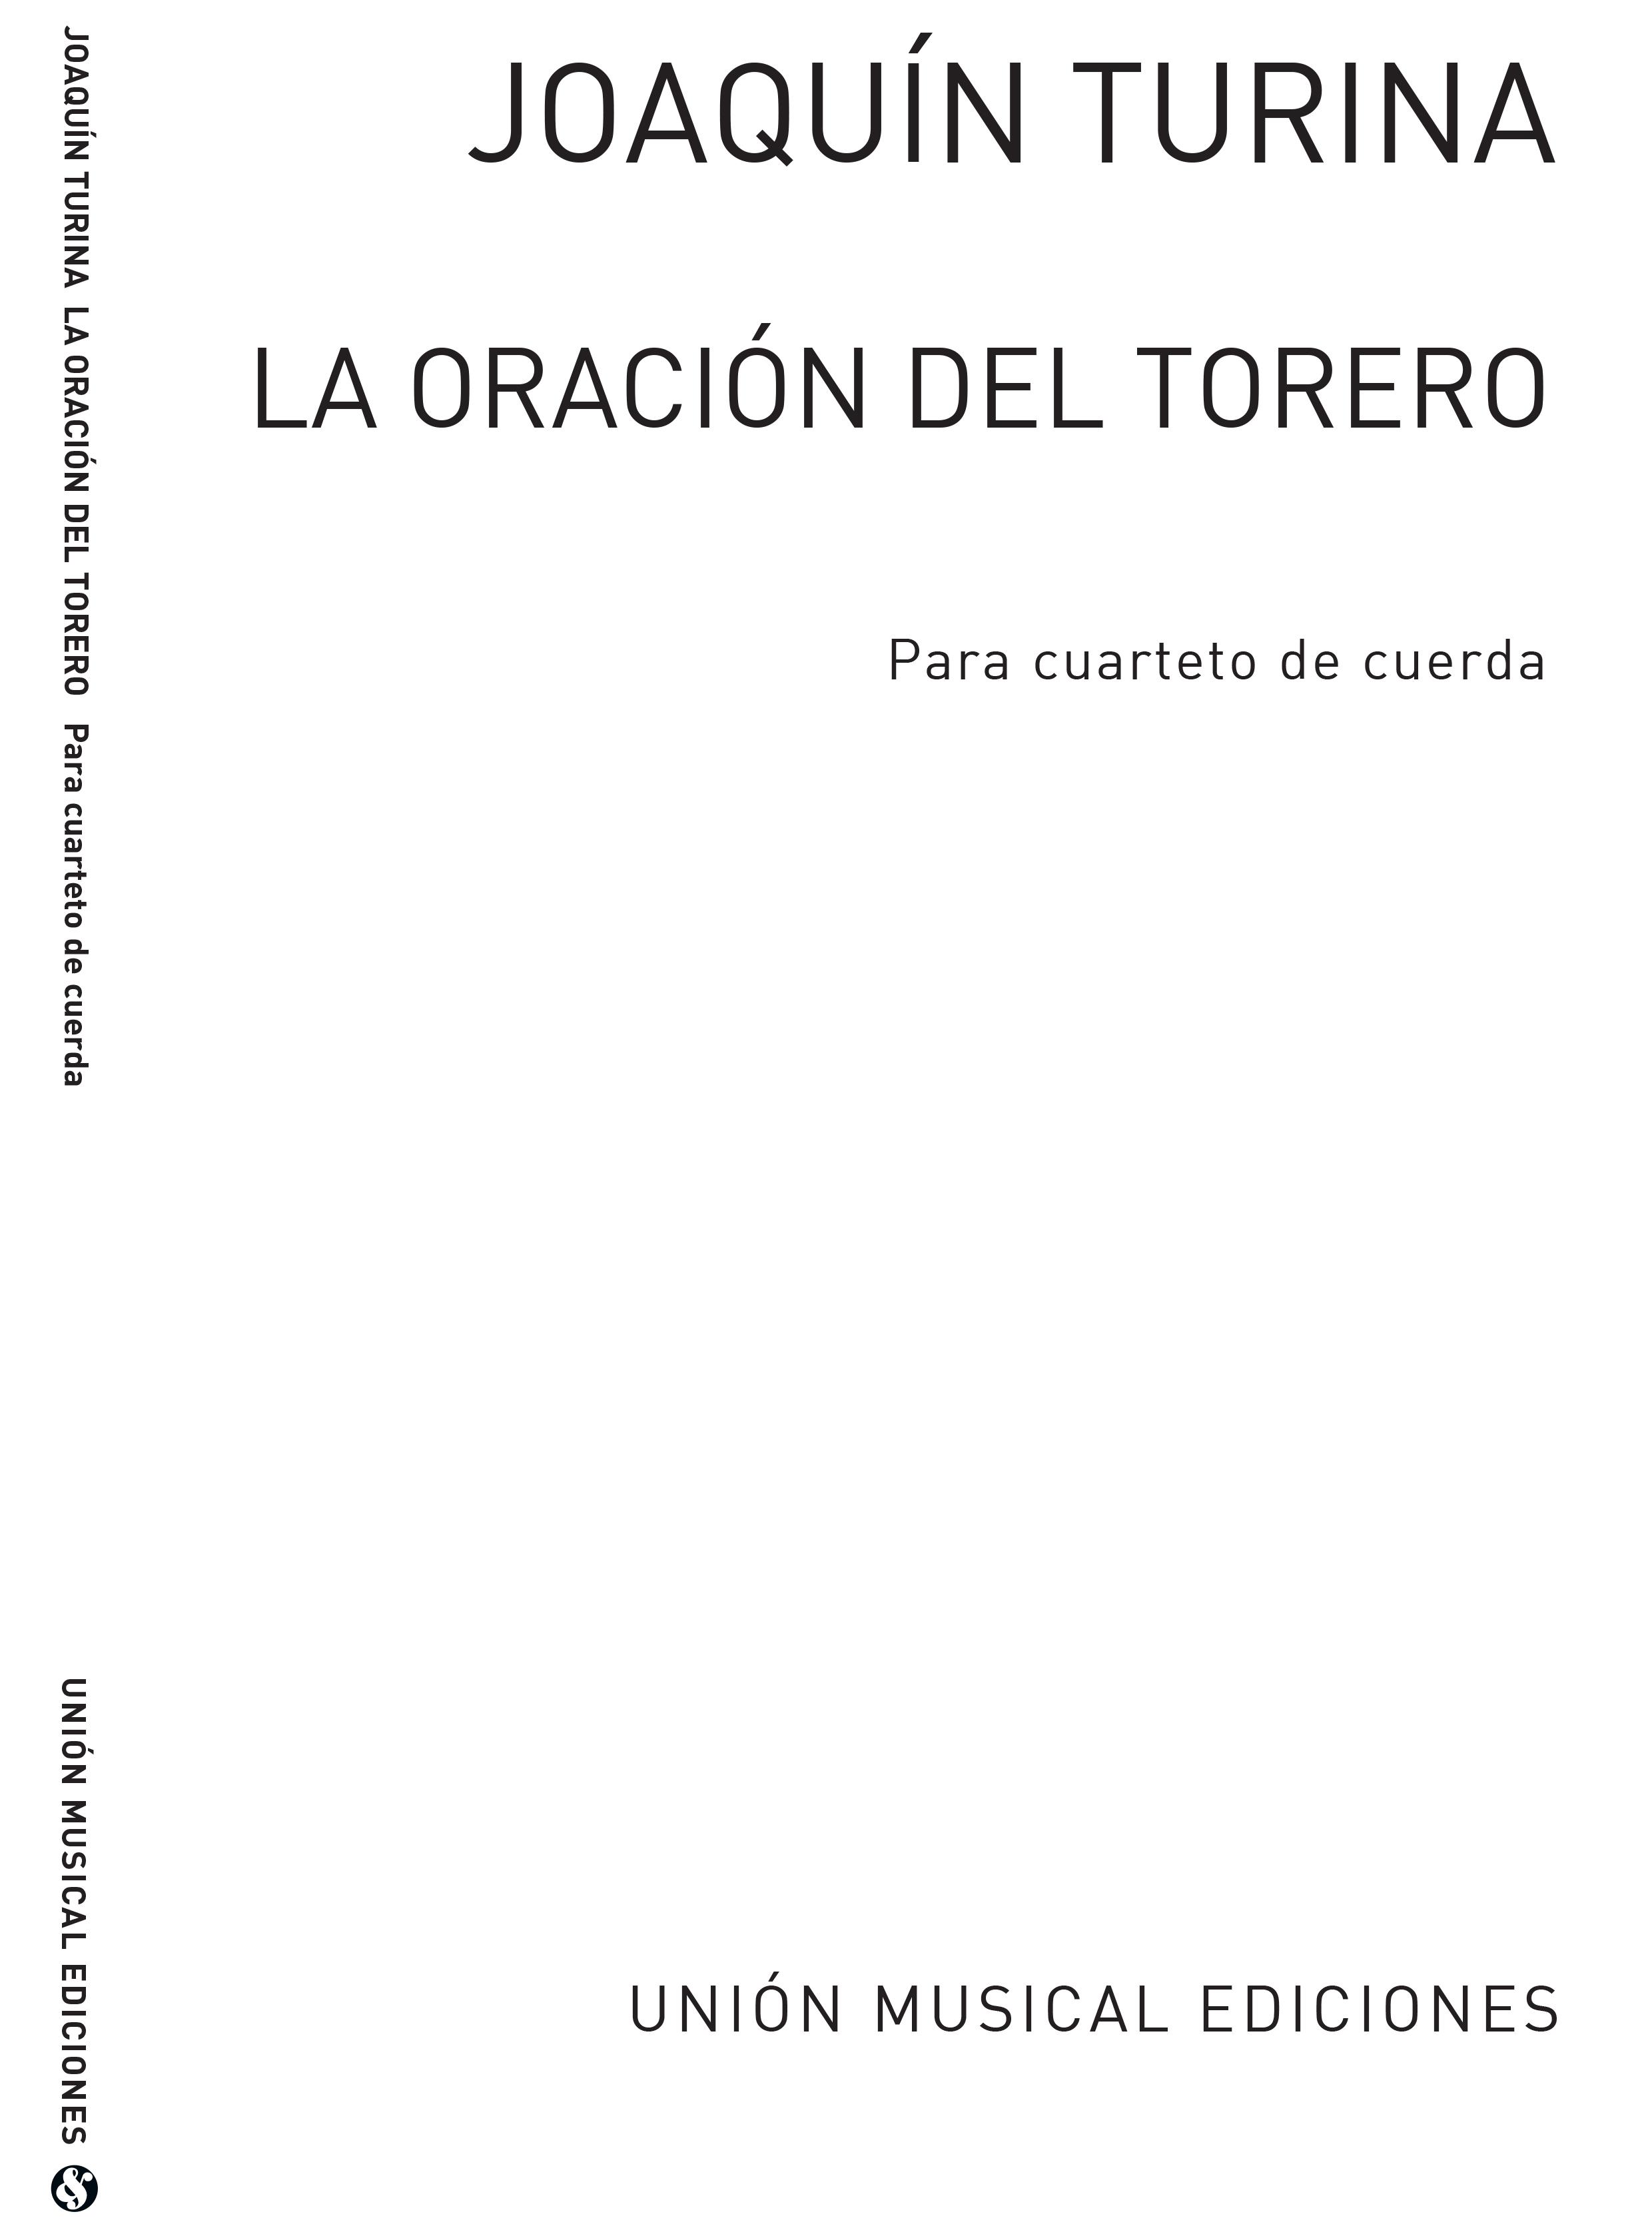 Joaquín Turina: La Oracion Del Torero: String Quartet: Instrumental Work